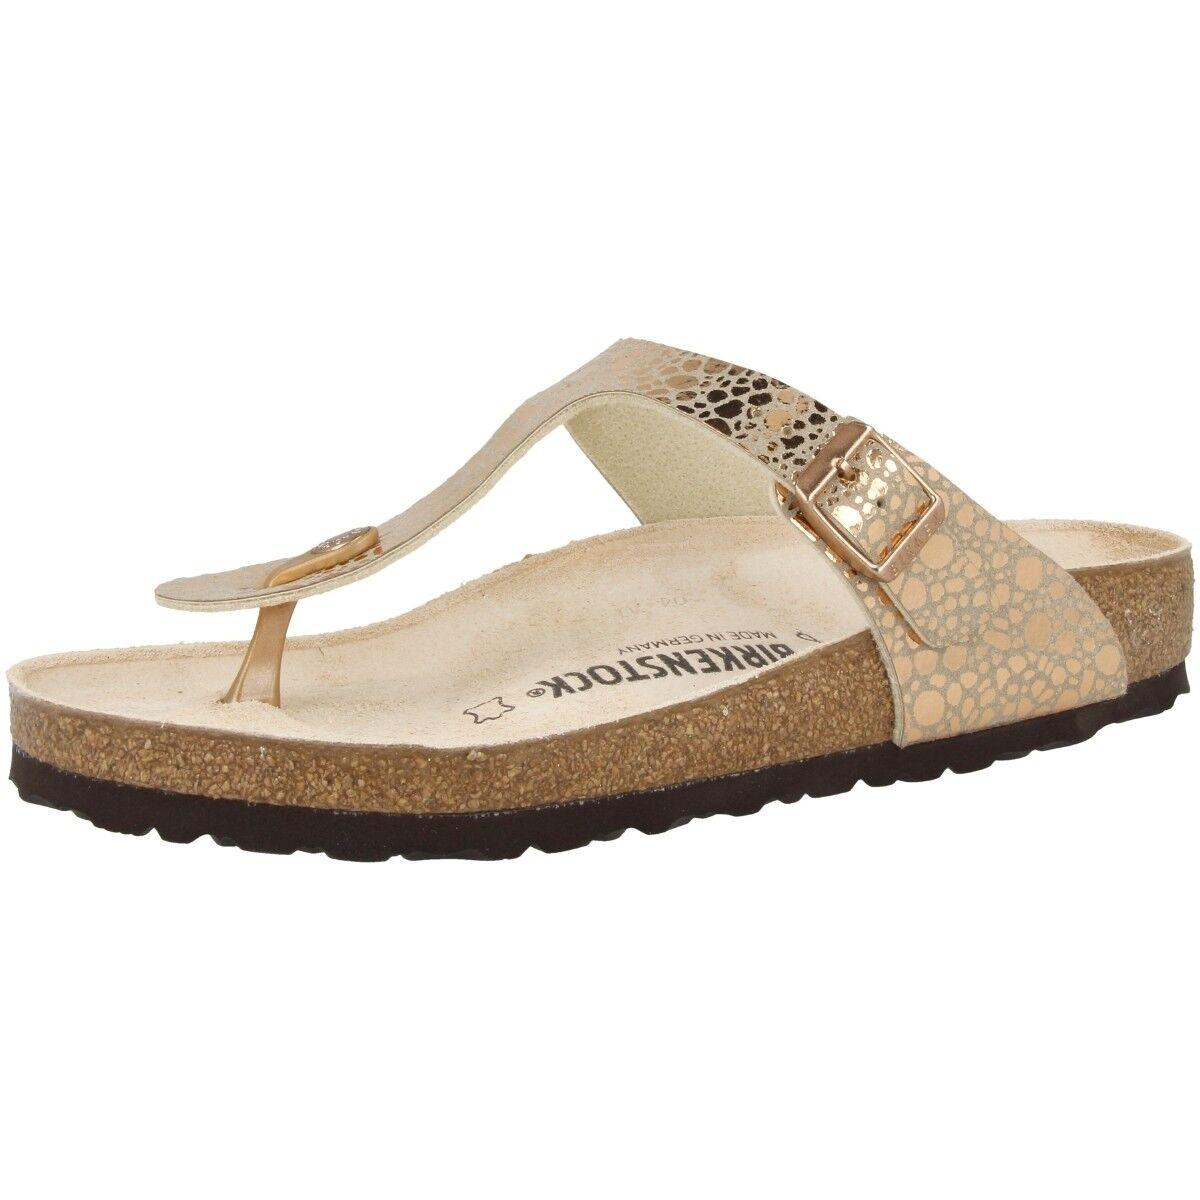 Birkenstock Gizeh Birko-Flor Damen Zehentrenner Sandale Weite normal 1005674